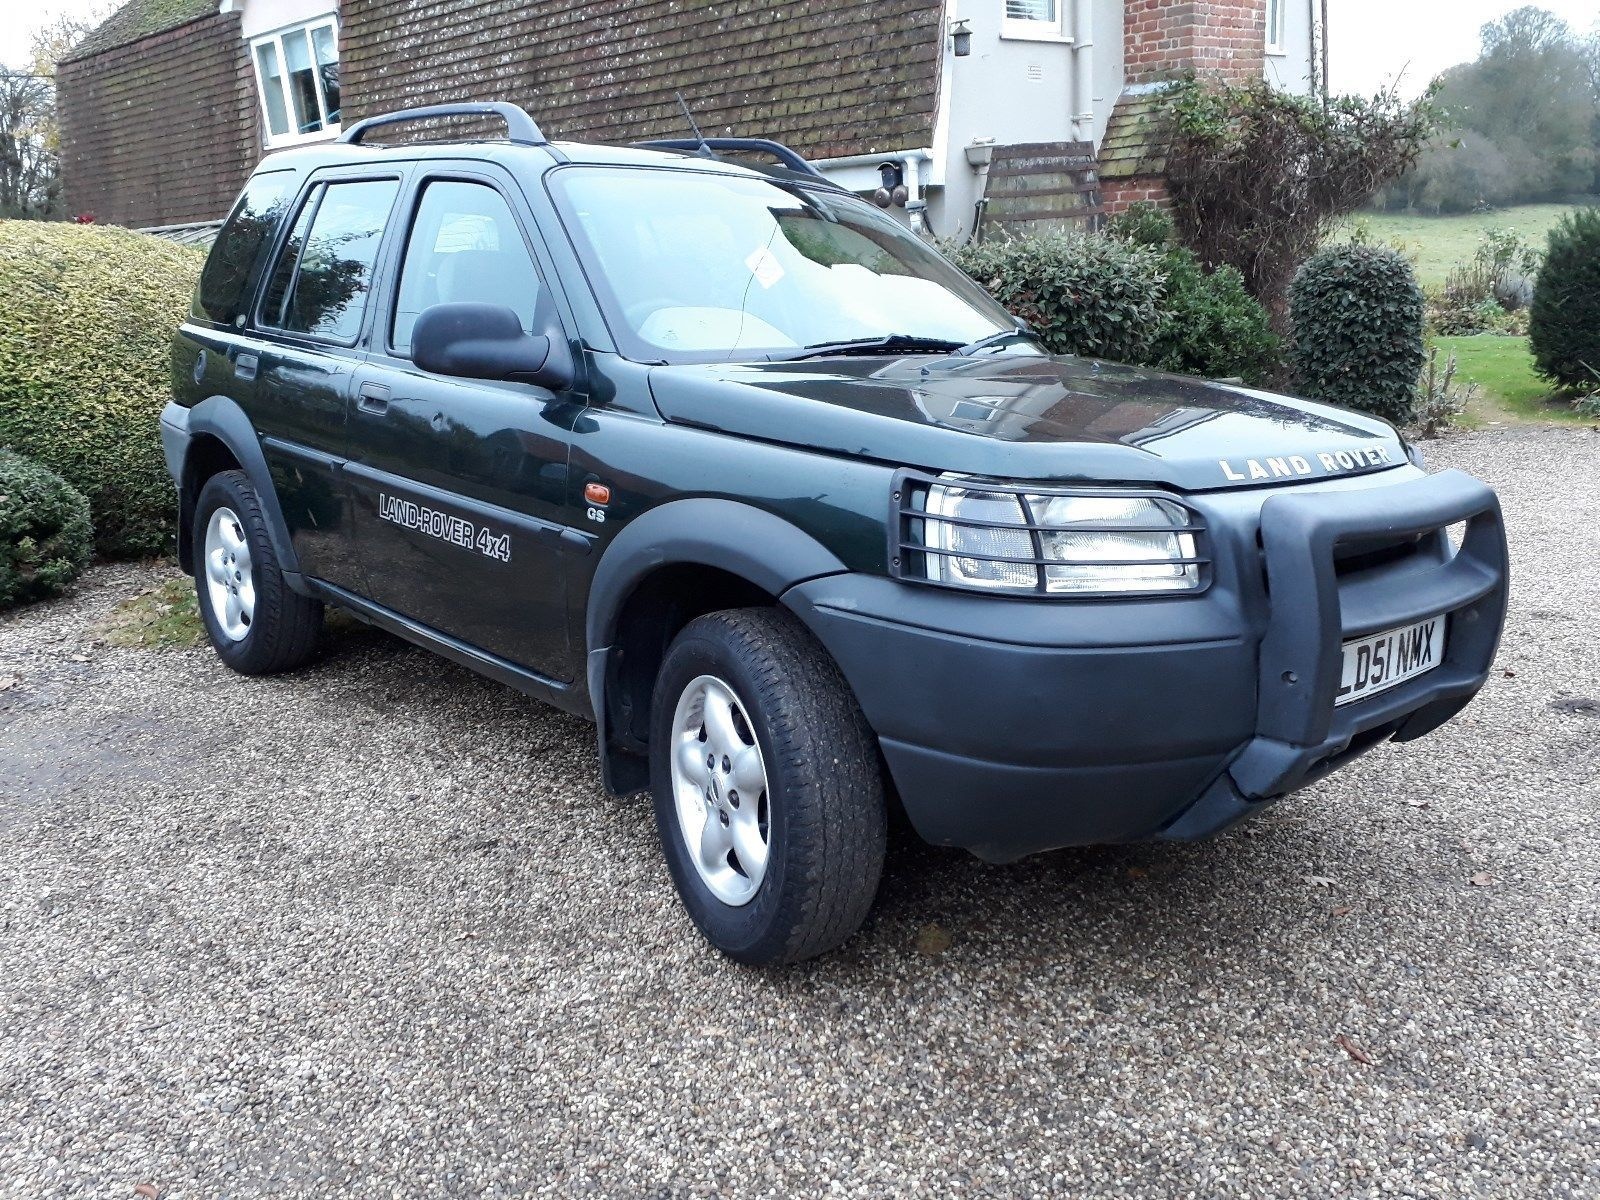 eBay: Land rover Freelander Td4 wagon 4x4 Automatic. Spares/repairs